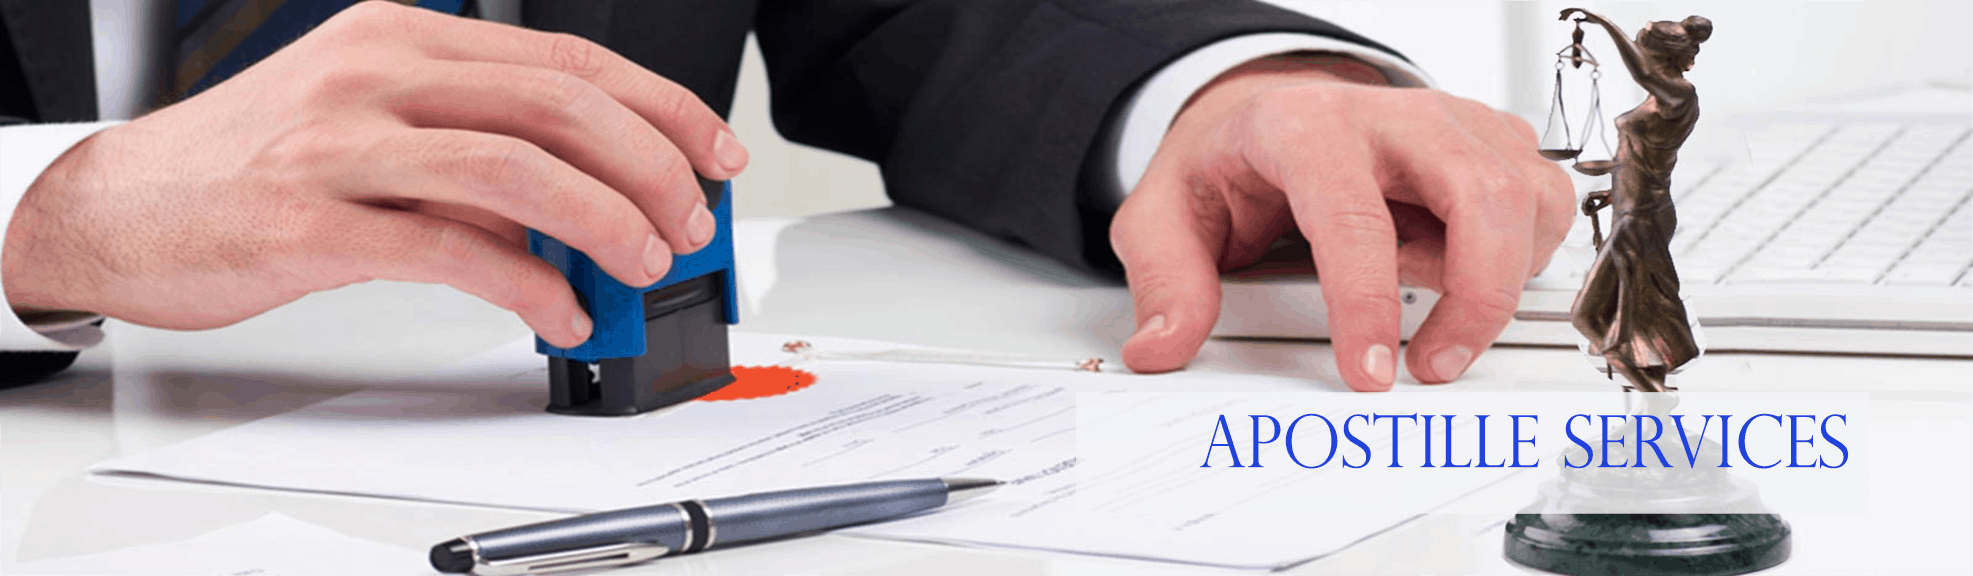 Apostille Services in UAE